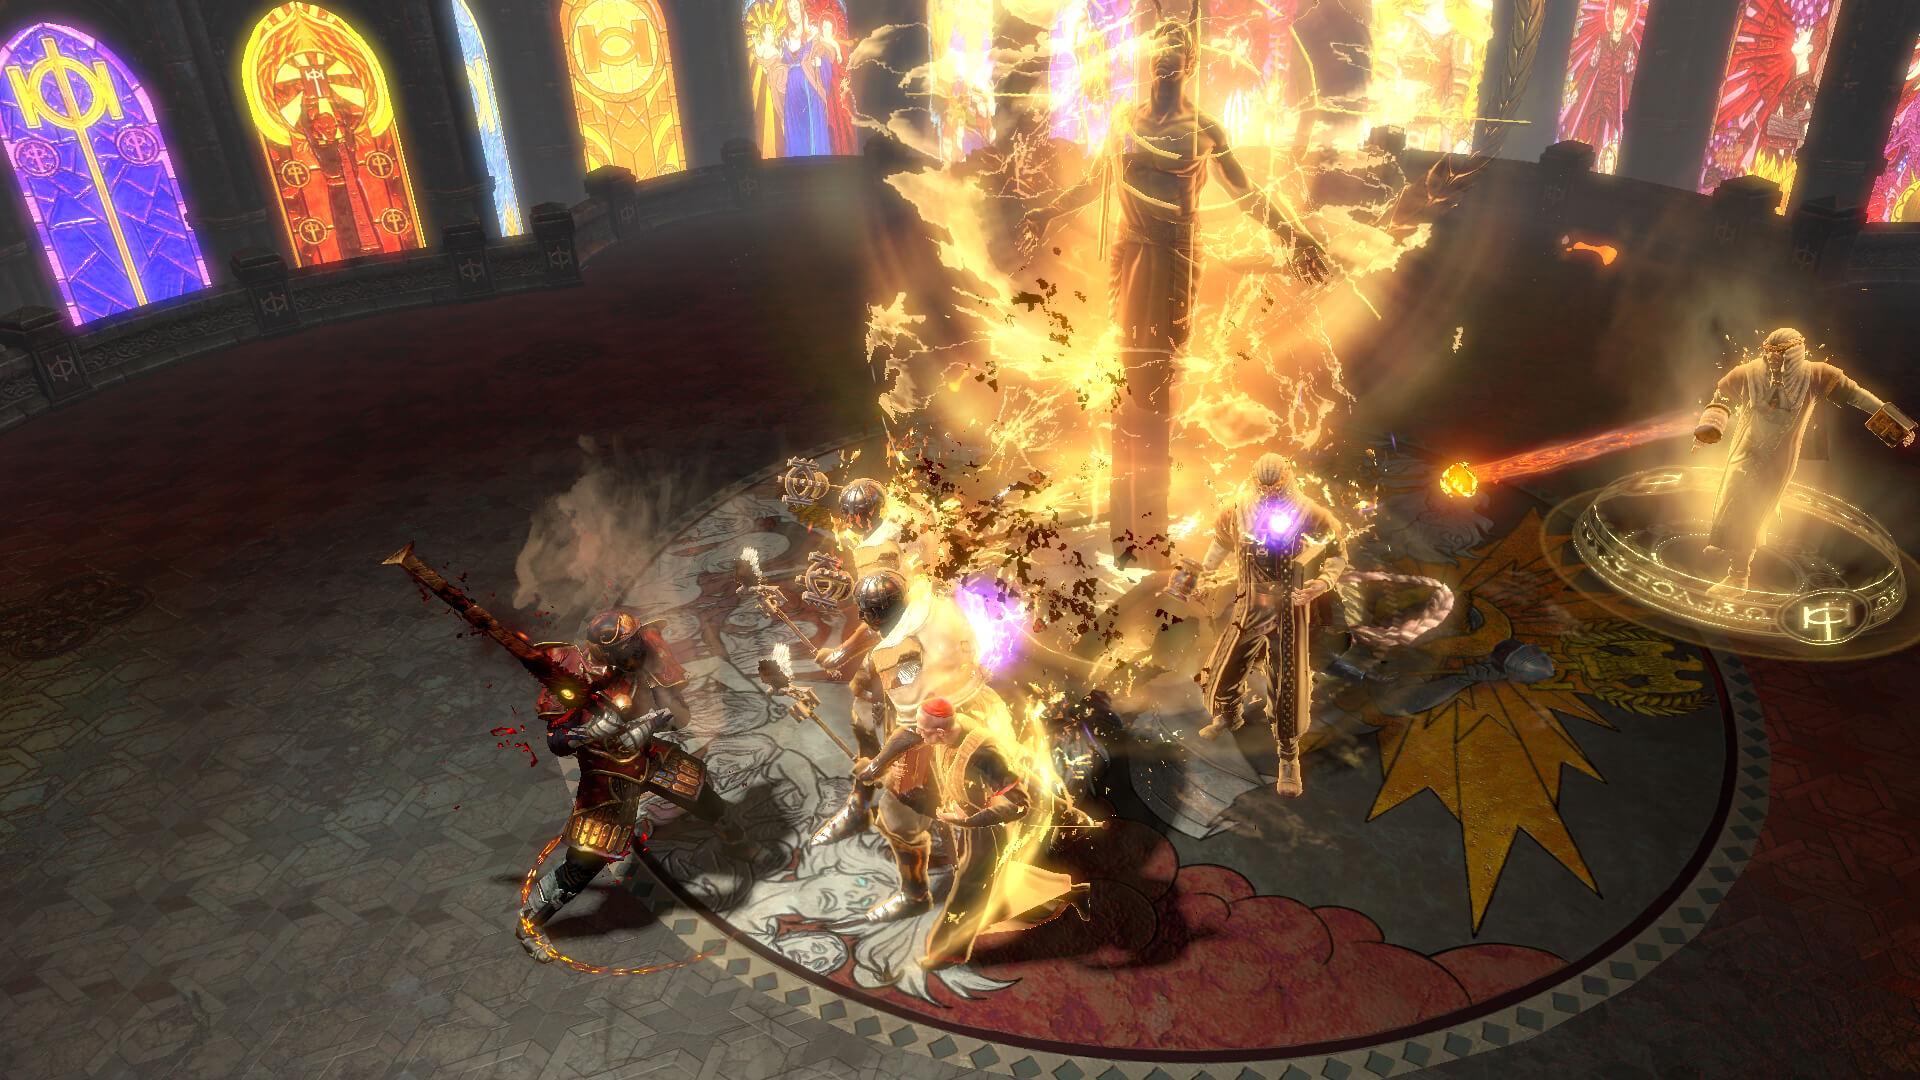 migliori free to play 2020 giochi free to play 2020 migliori giochi gratis 2020 MMO gratis MMORPG gratis path of exile